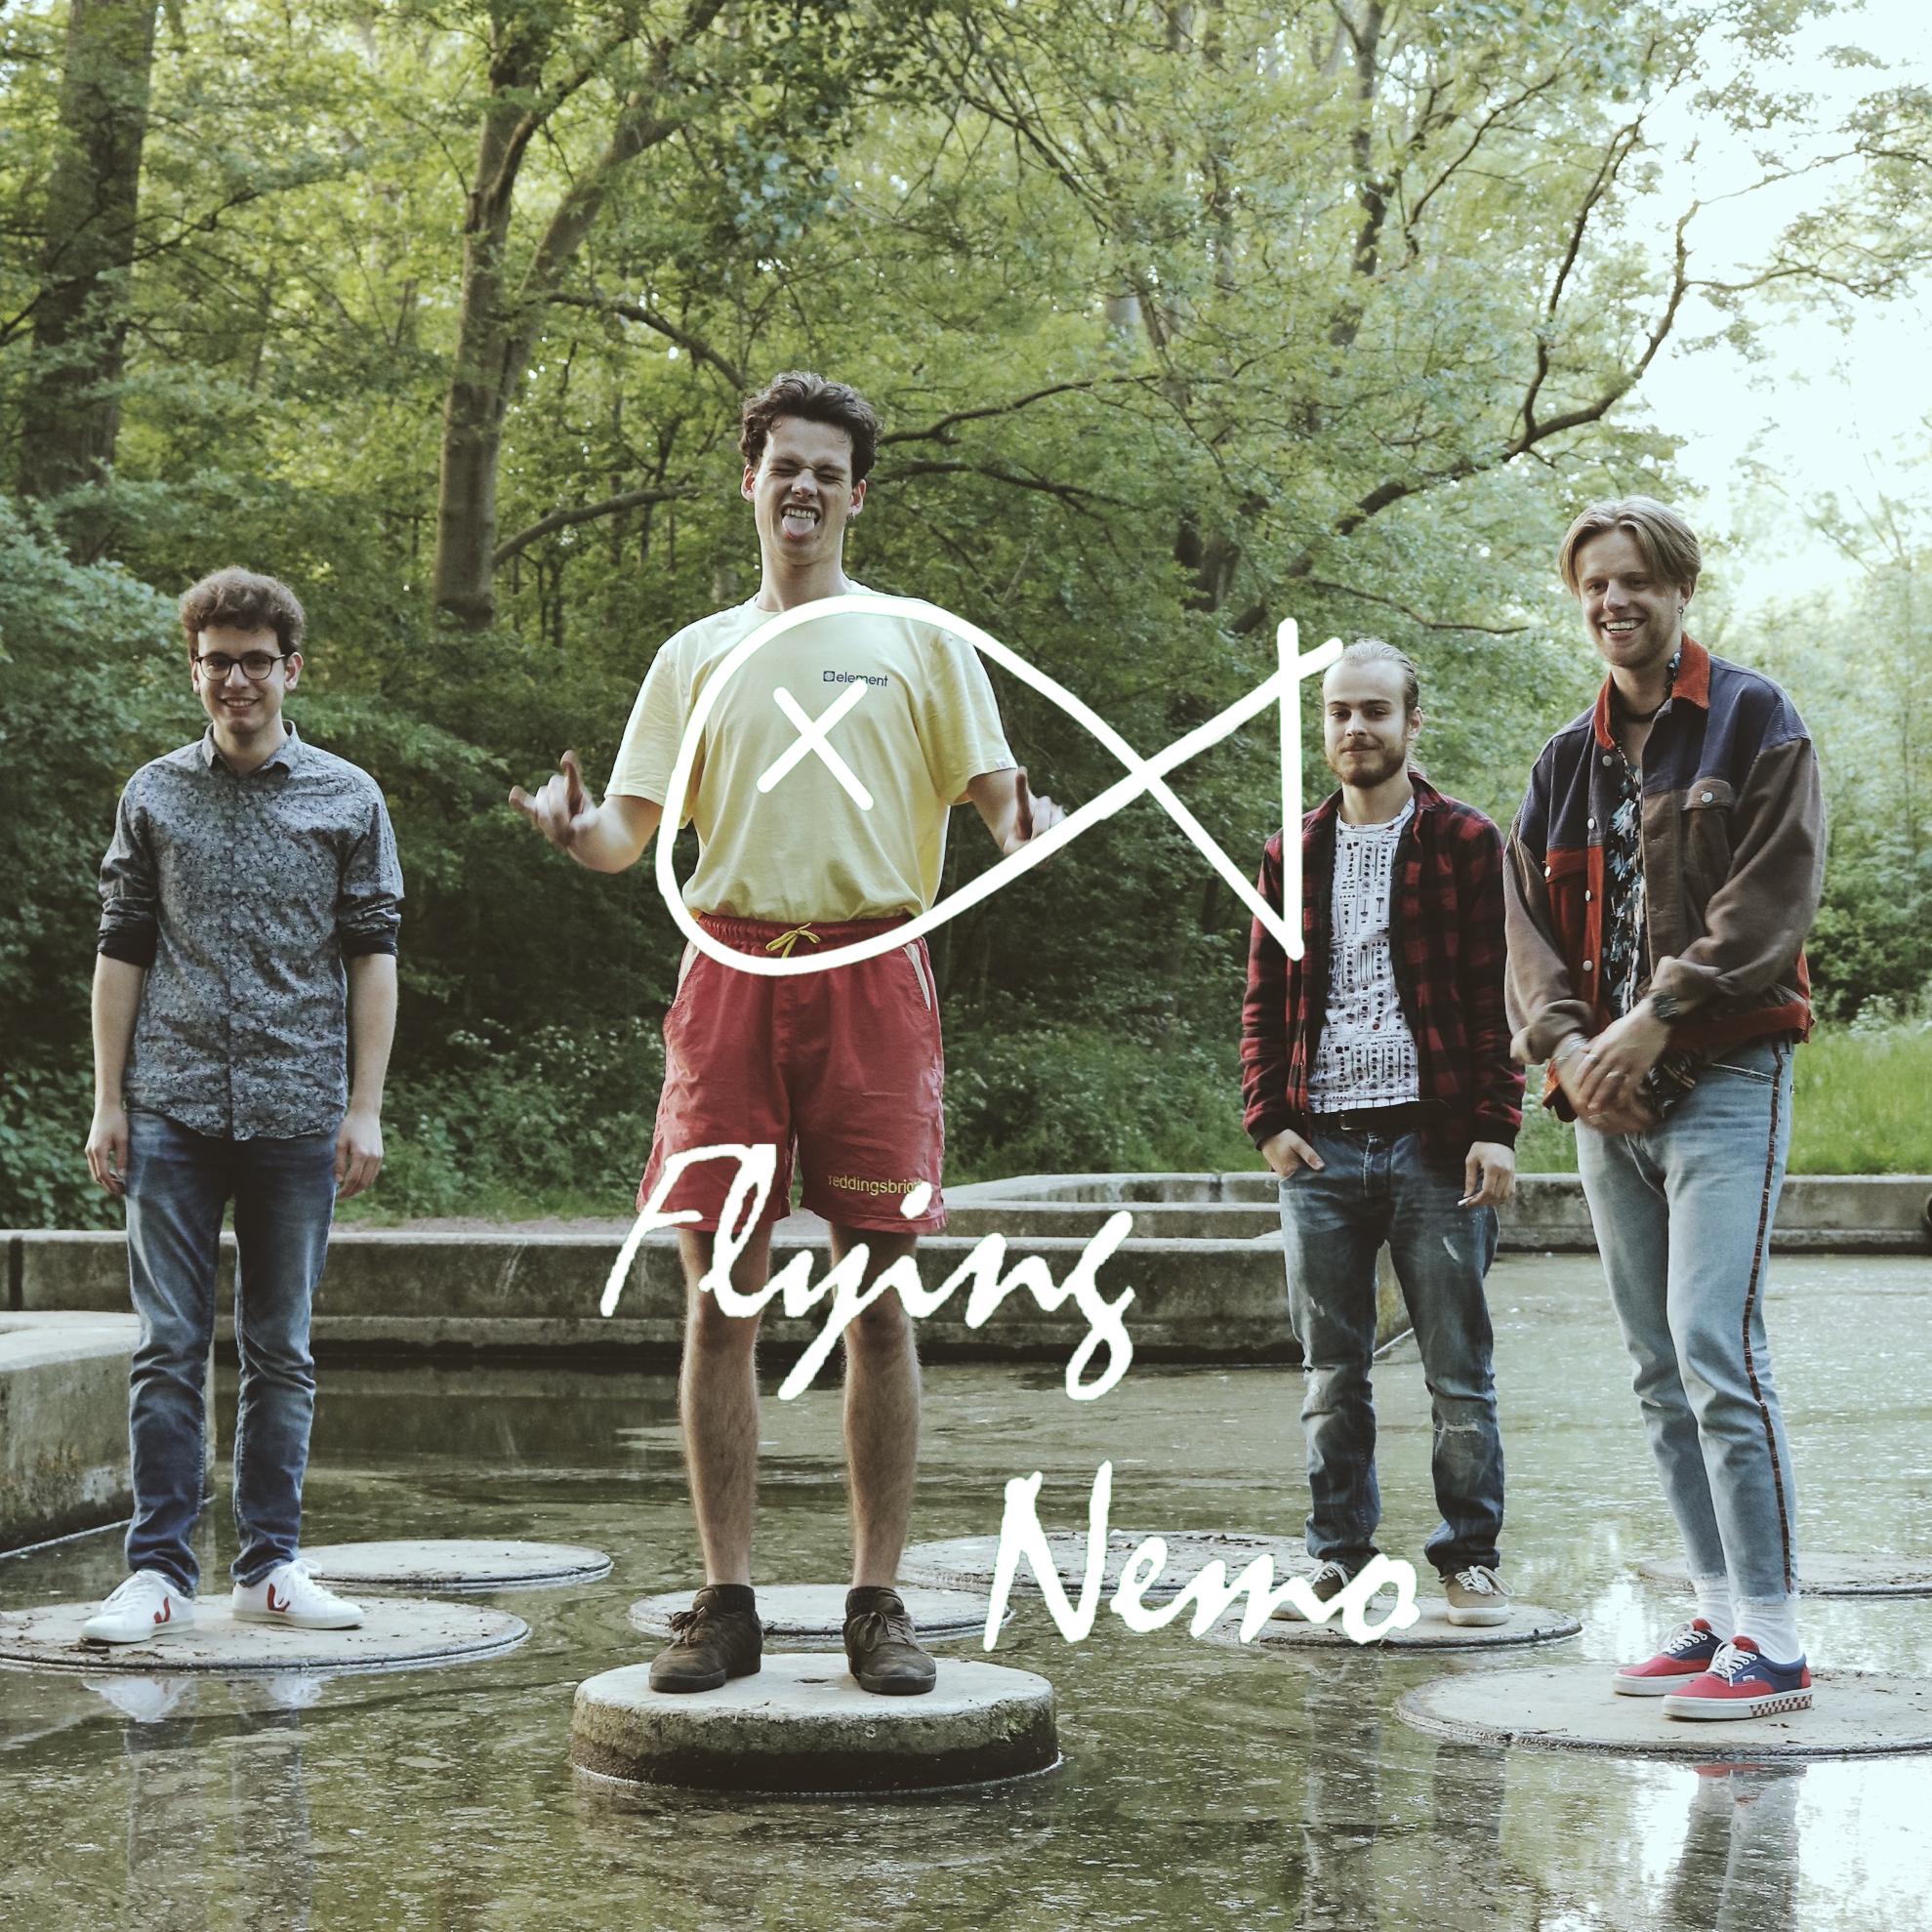 Flying Nemo